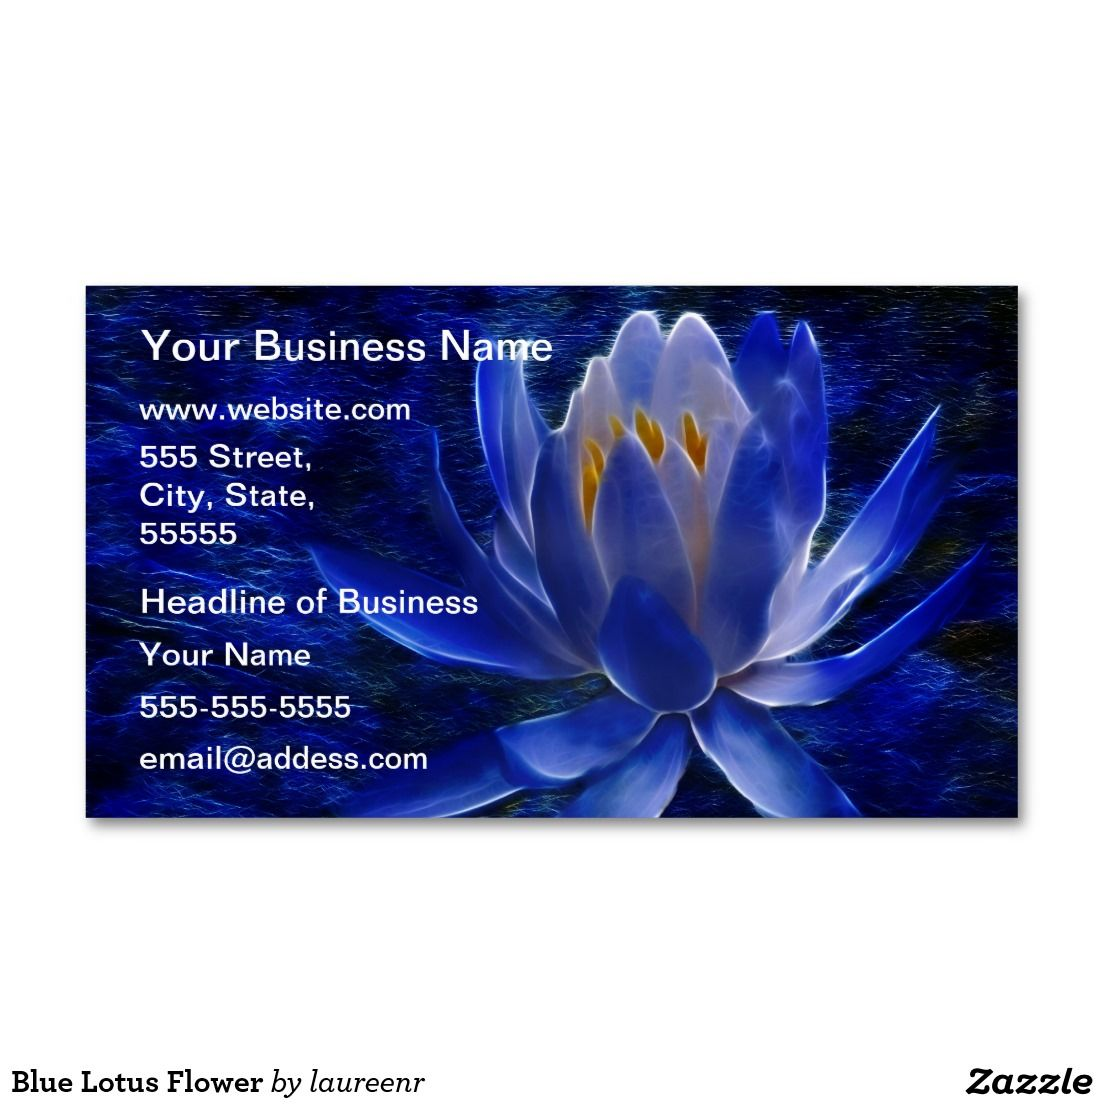 Blue Lotus Flower Business Card | Blue lotus flower